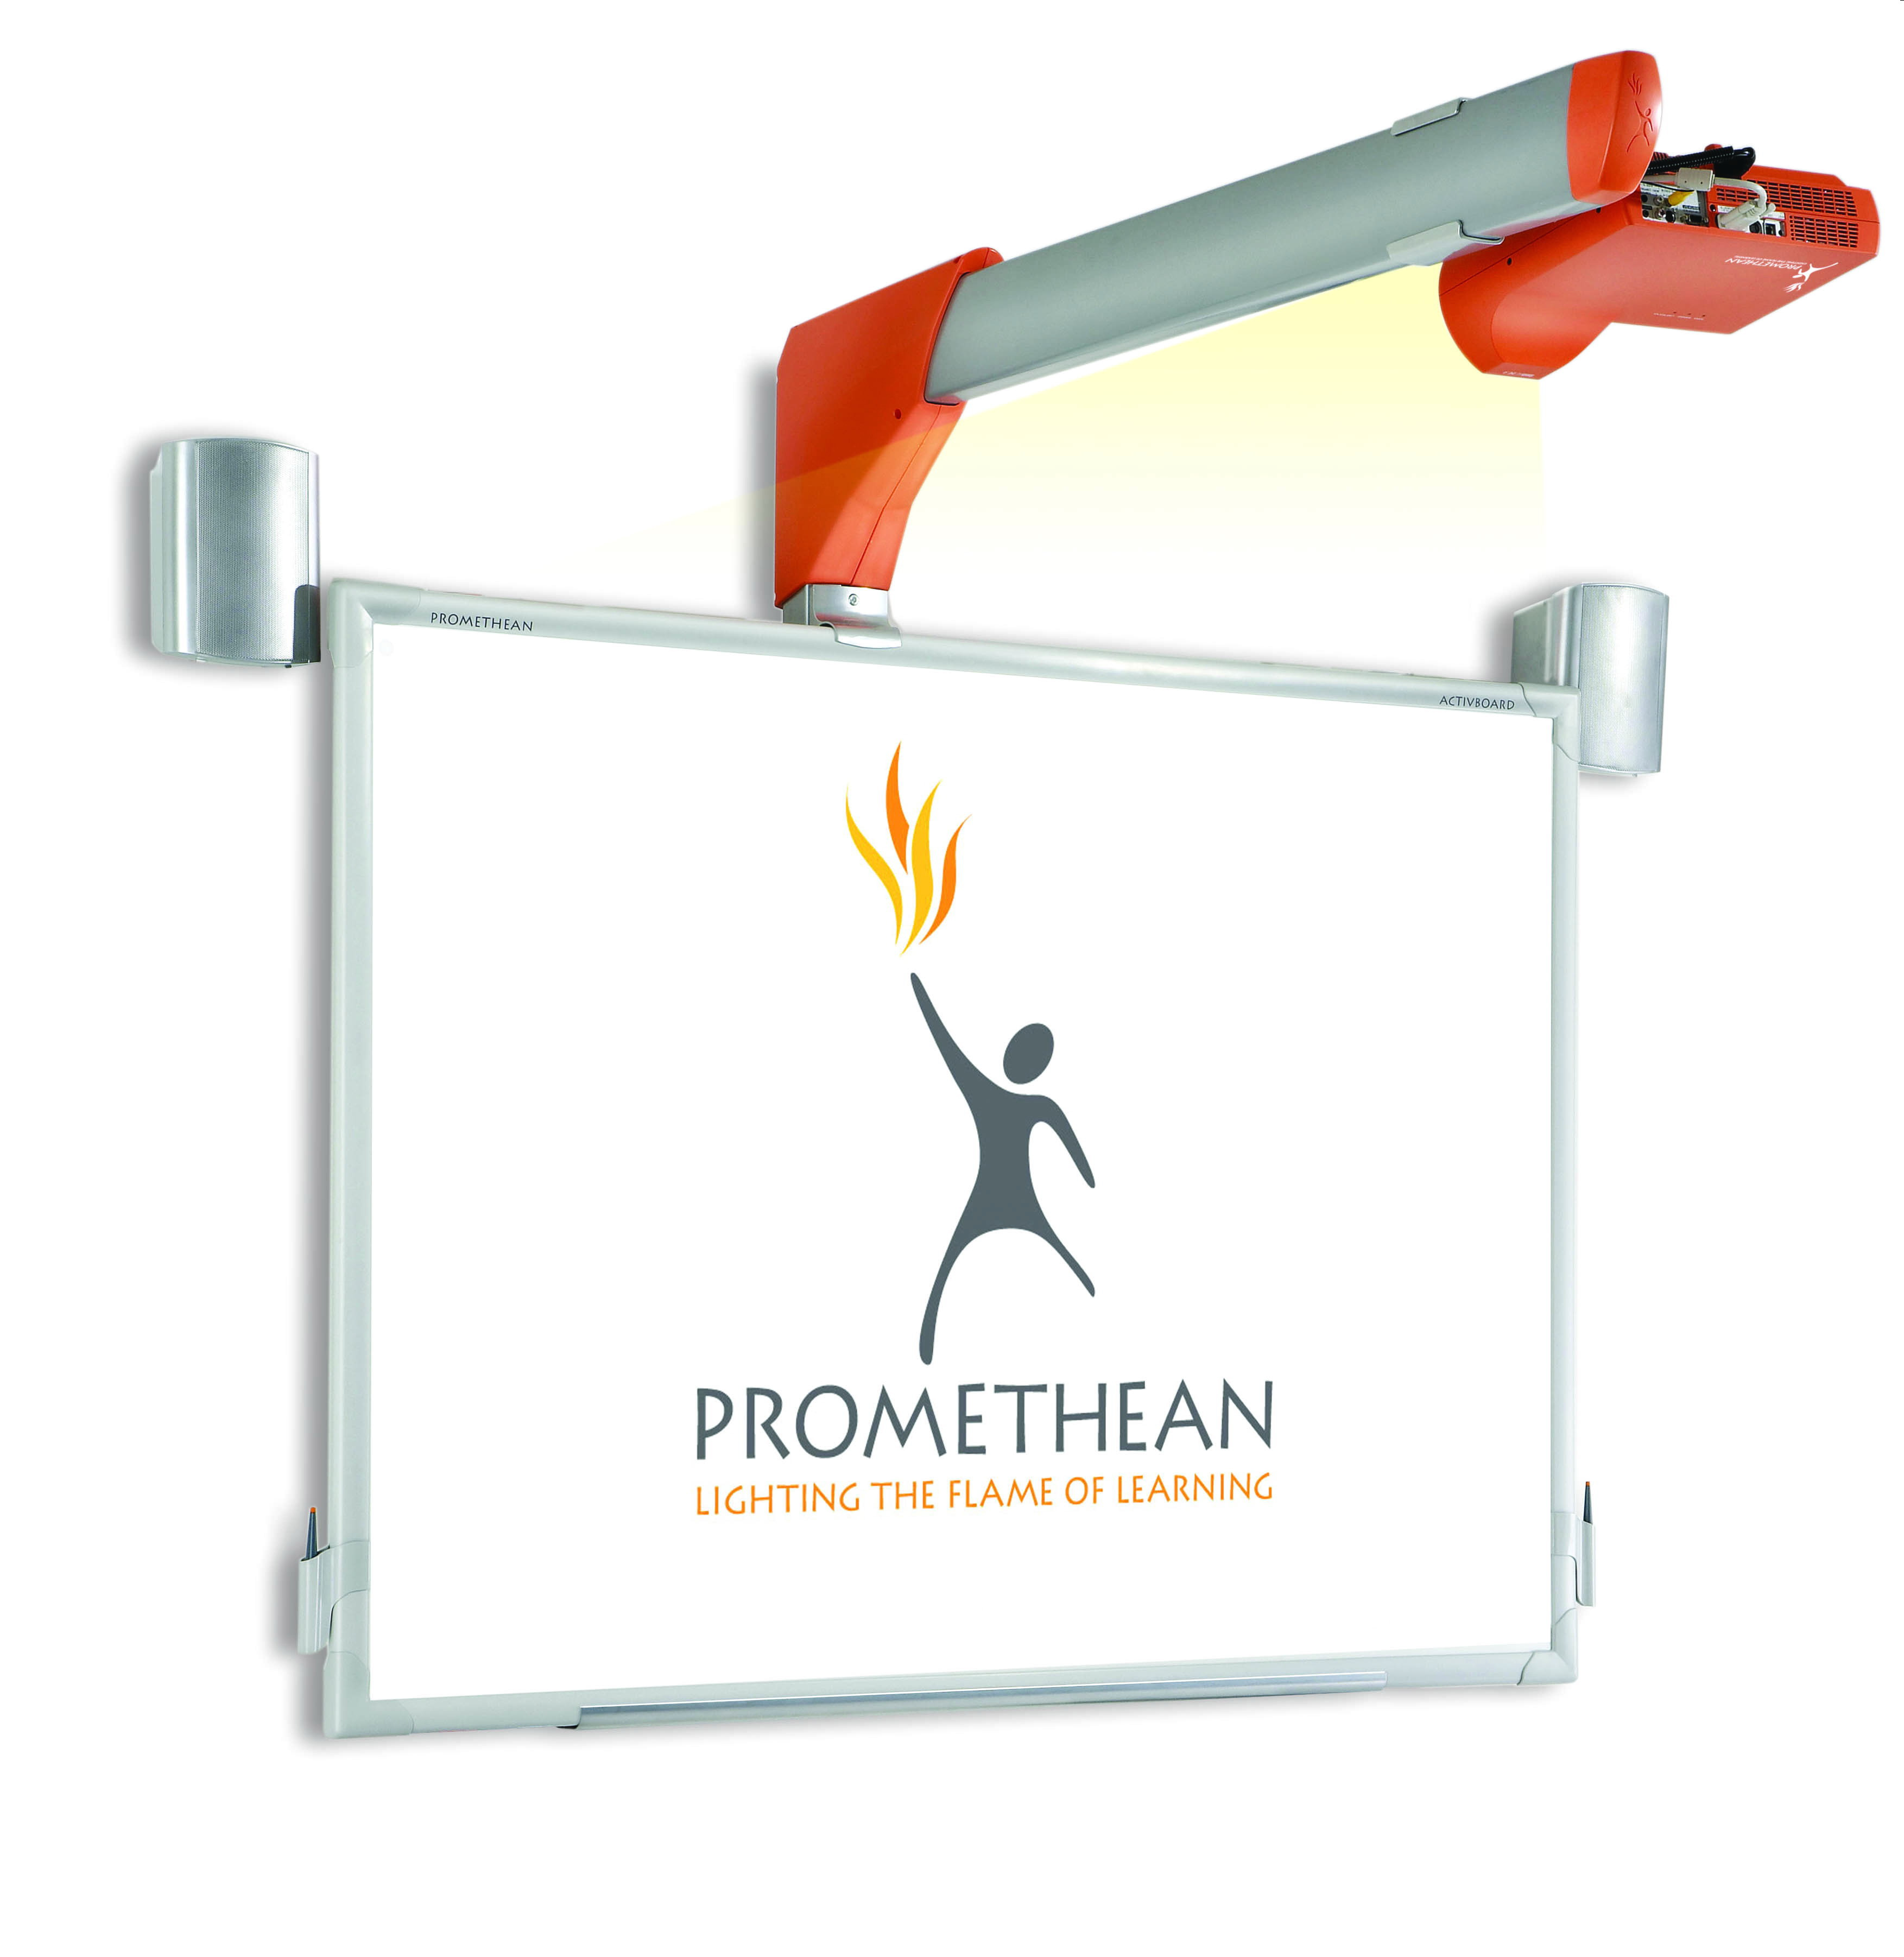 Promethean activboard drivers download